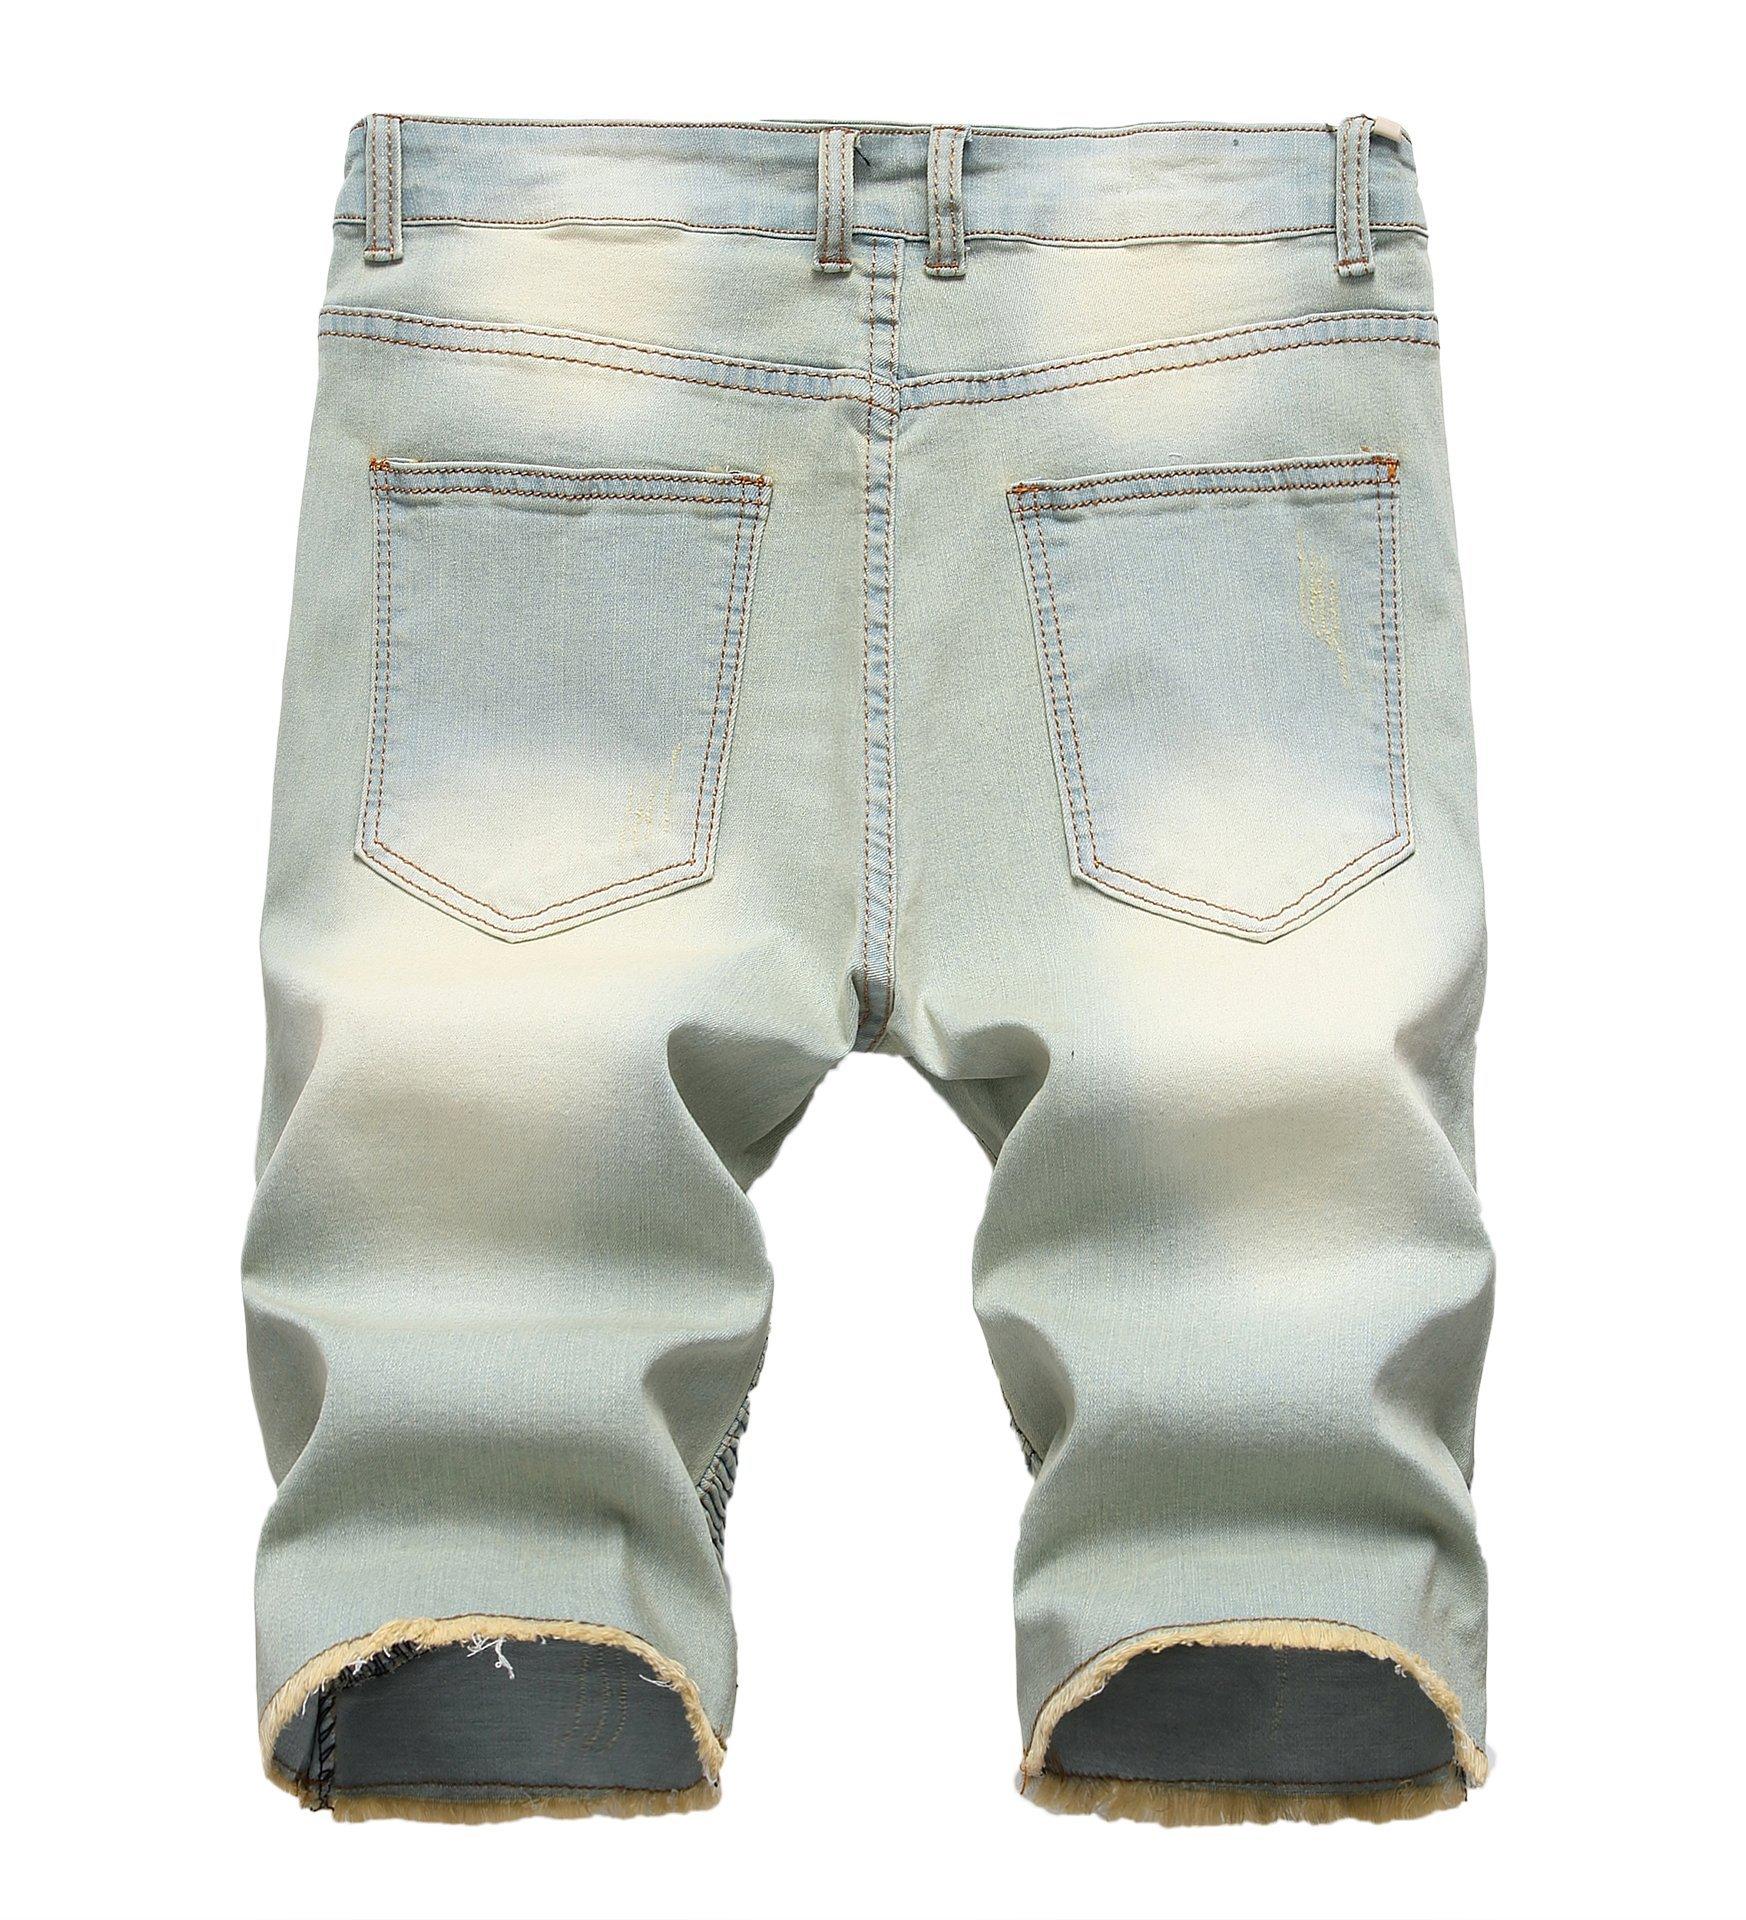 CLANNAD Men's Moto Biker Shorts Jeans Zipper Denim Casual Slim Shorts with Hole Vintage Blue 30 by CLANNAD (Image #2)